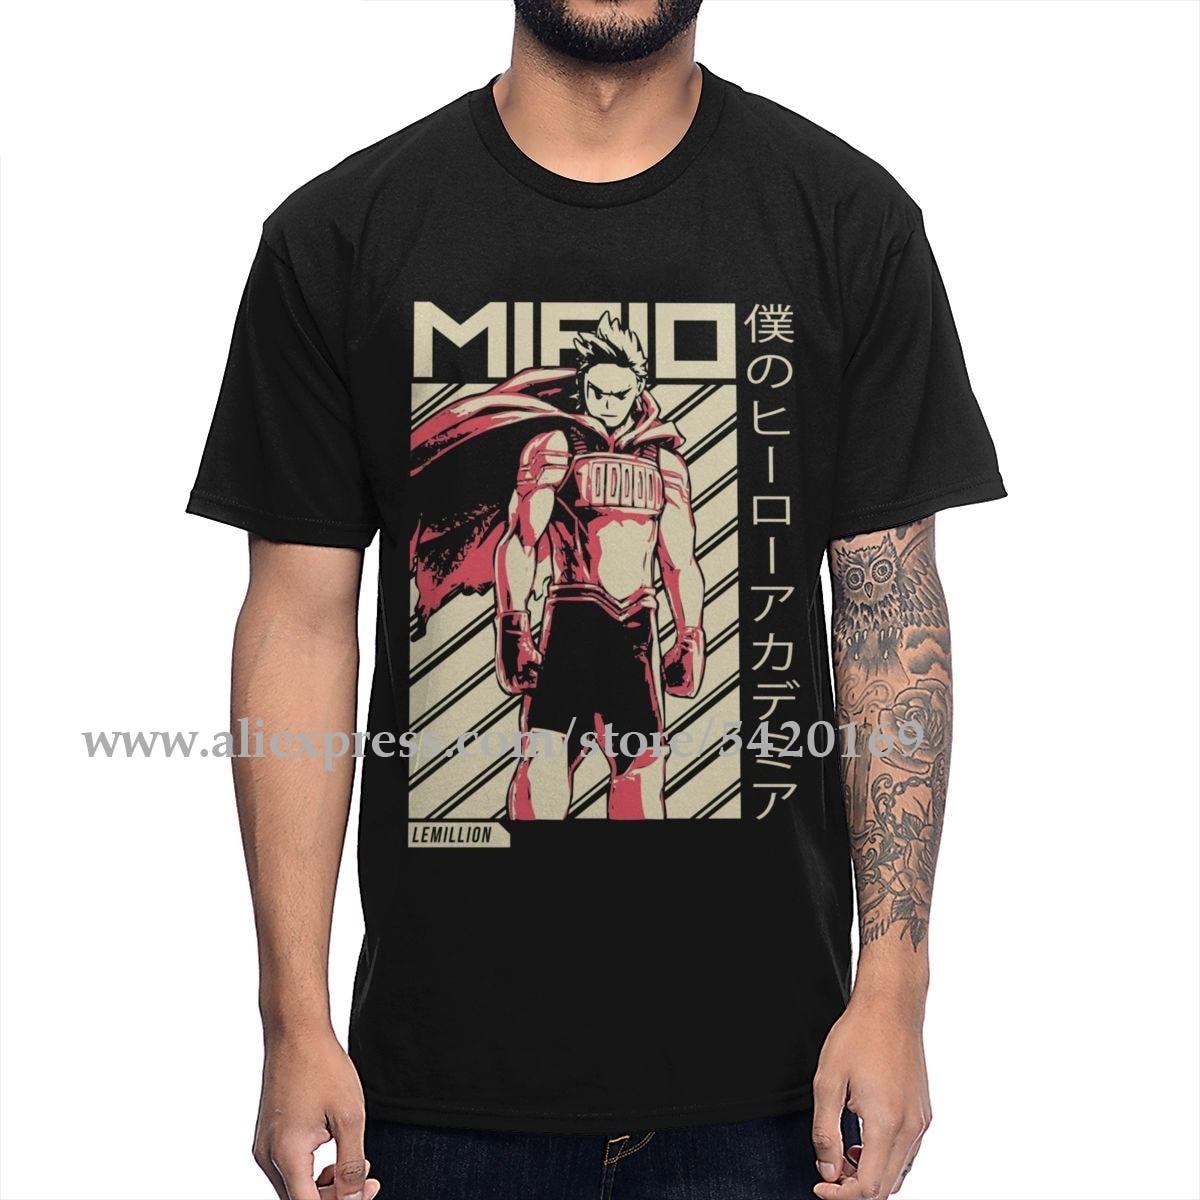 Funny Boku No Hero Academia Season 3 Mirio Togata Million T Shirt Man Streetwear Organic Cotton Soft Cotton Plus Size T-shirt